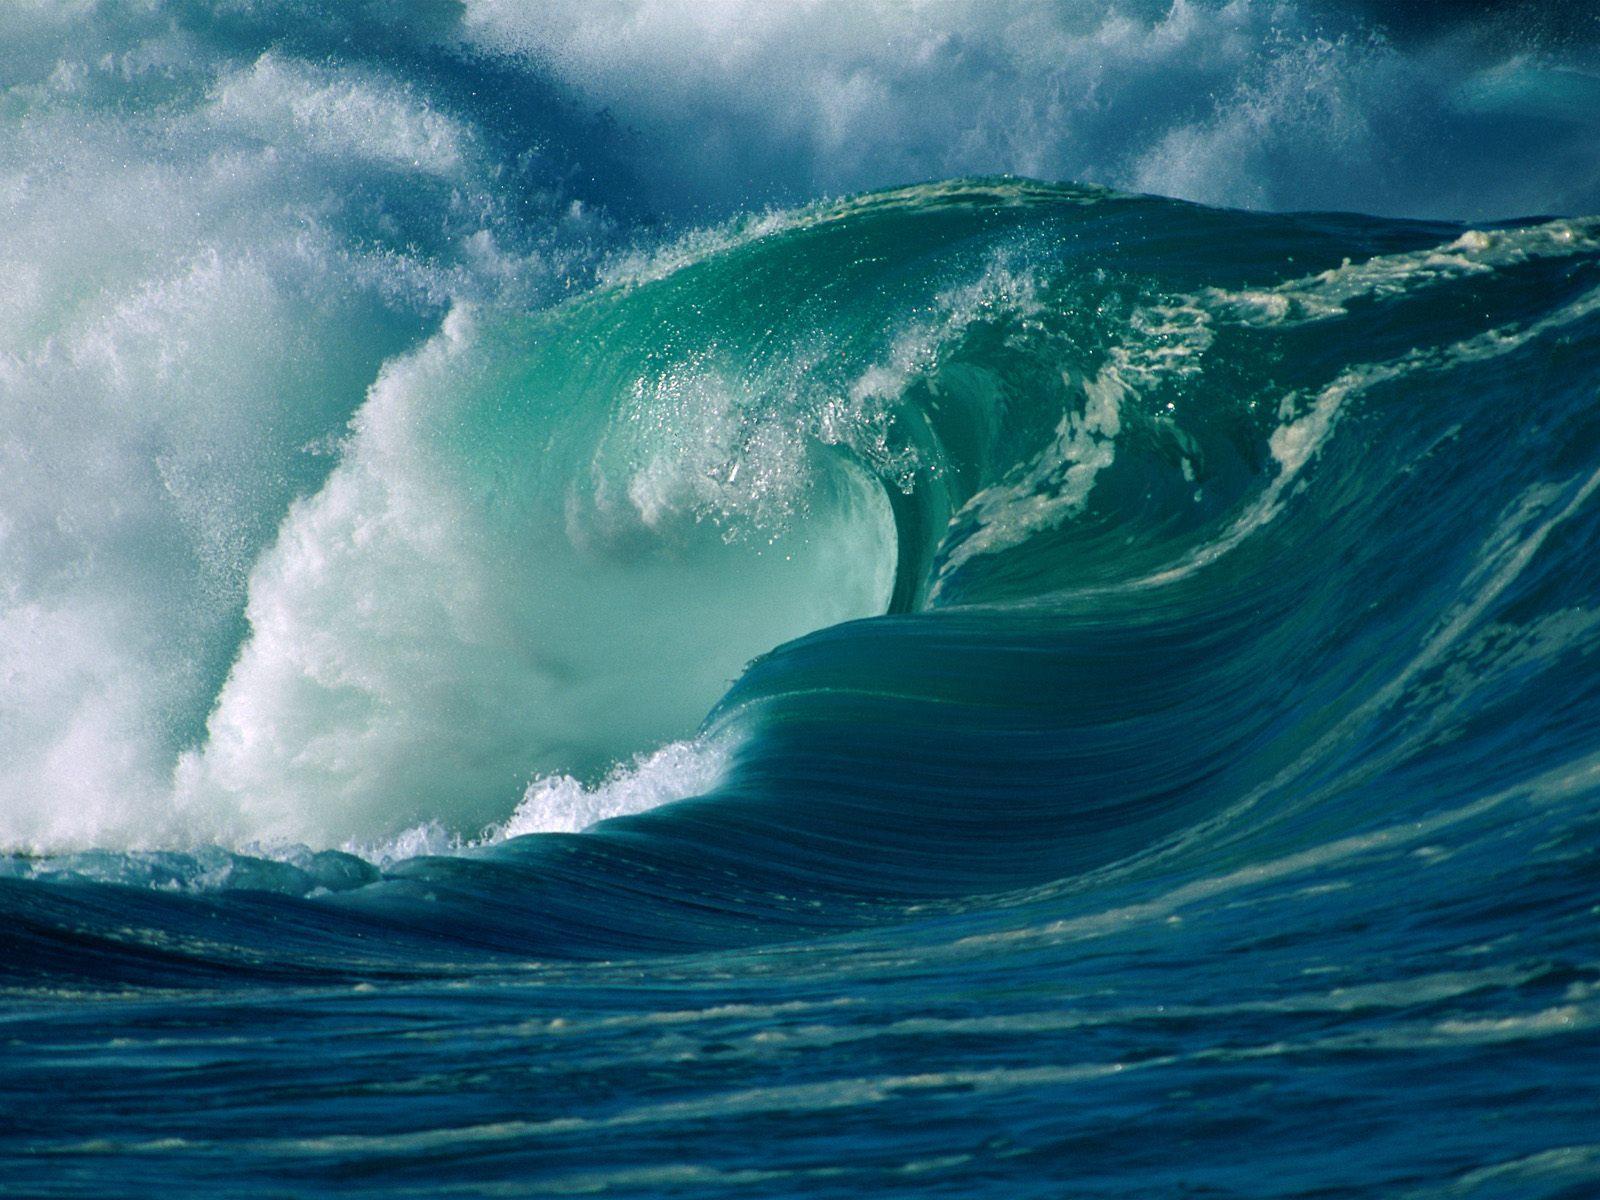 Tsunami wave free desktop background - free wallpaper image